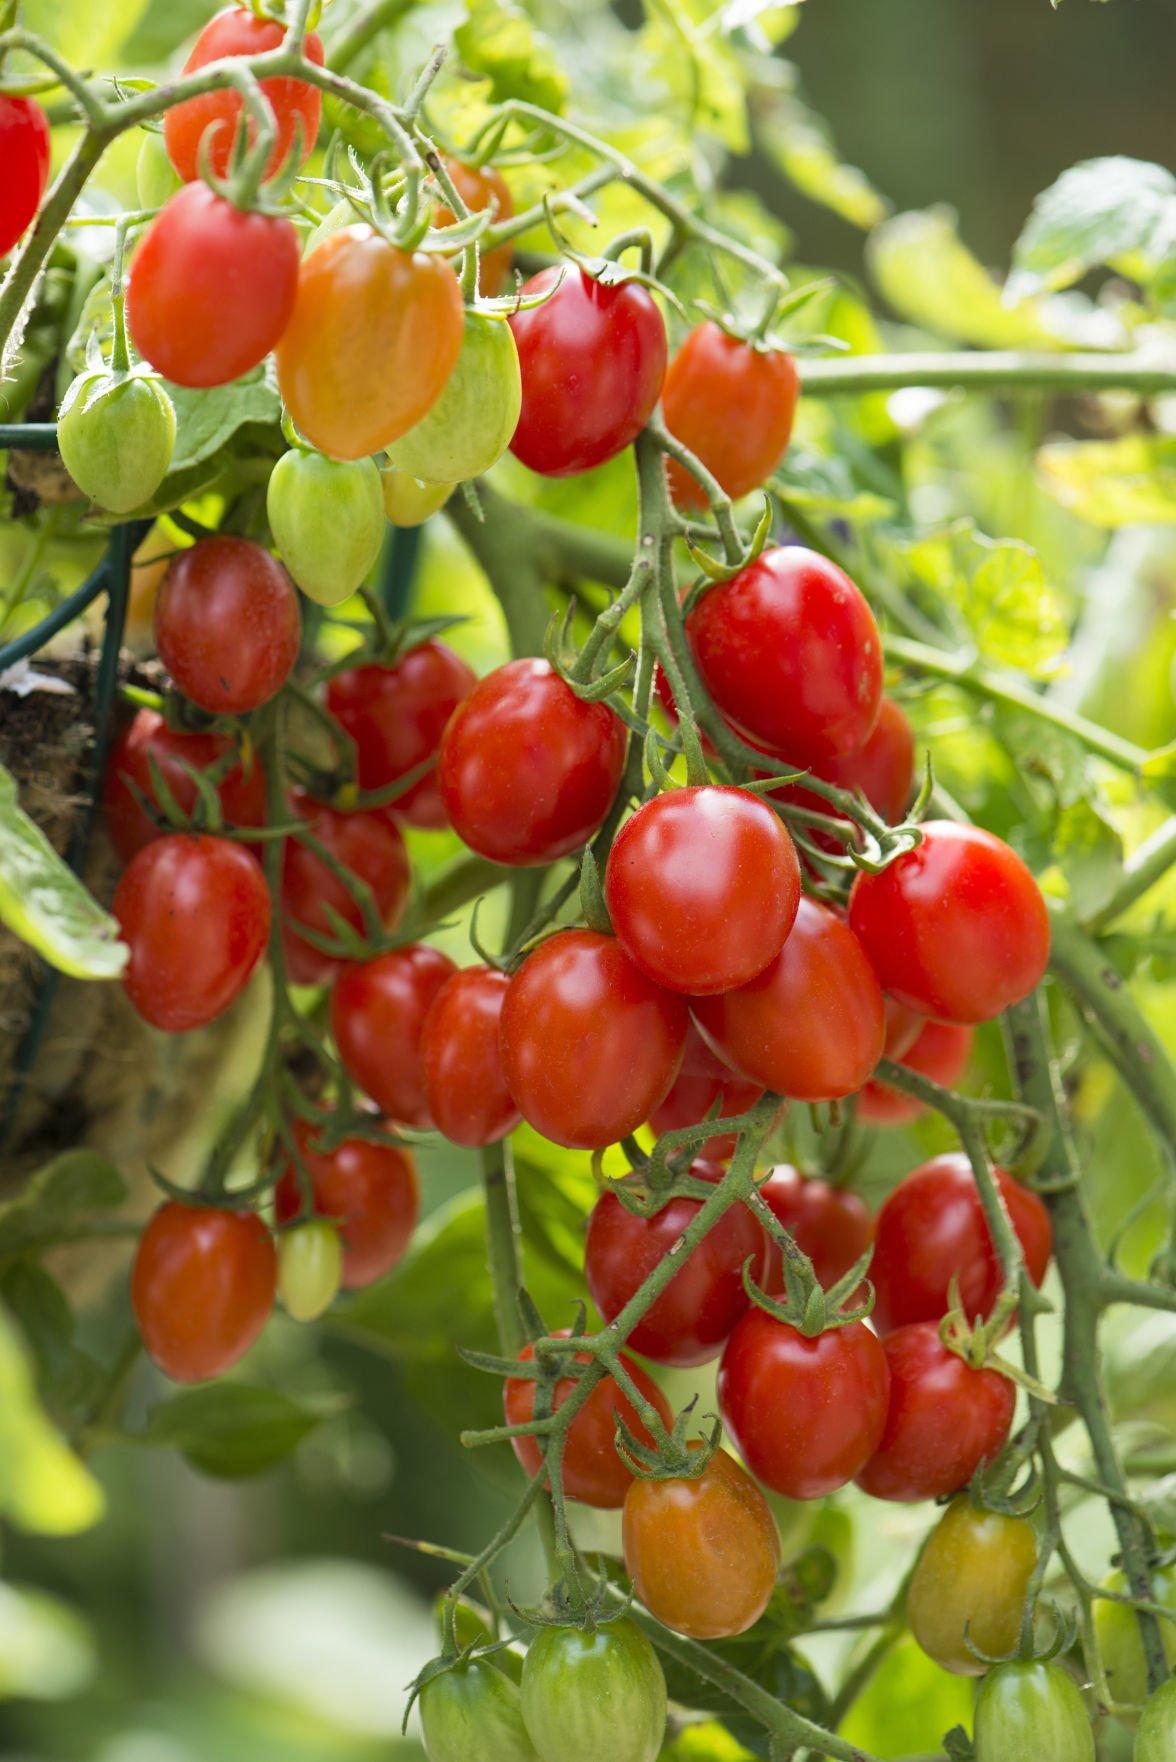 Tomato_Fantastico-onVine-1-resize.jpg